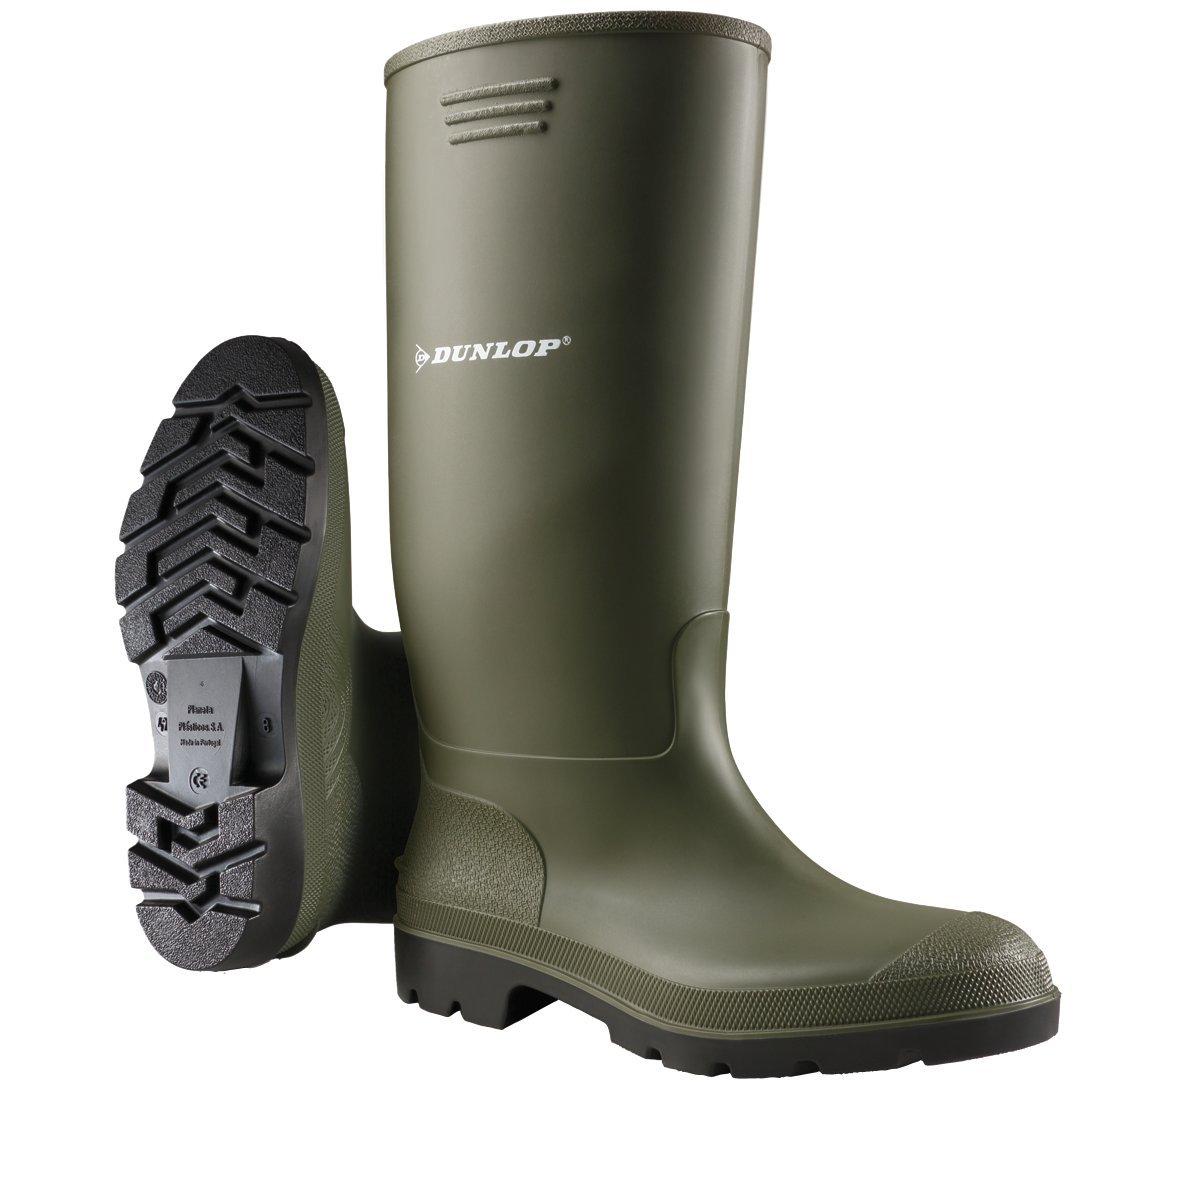 Dunlop Protective Footwear Unisex Adults Pricemastor Work Wellingtons